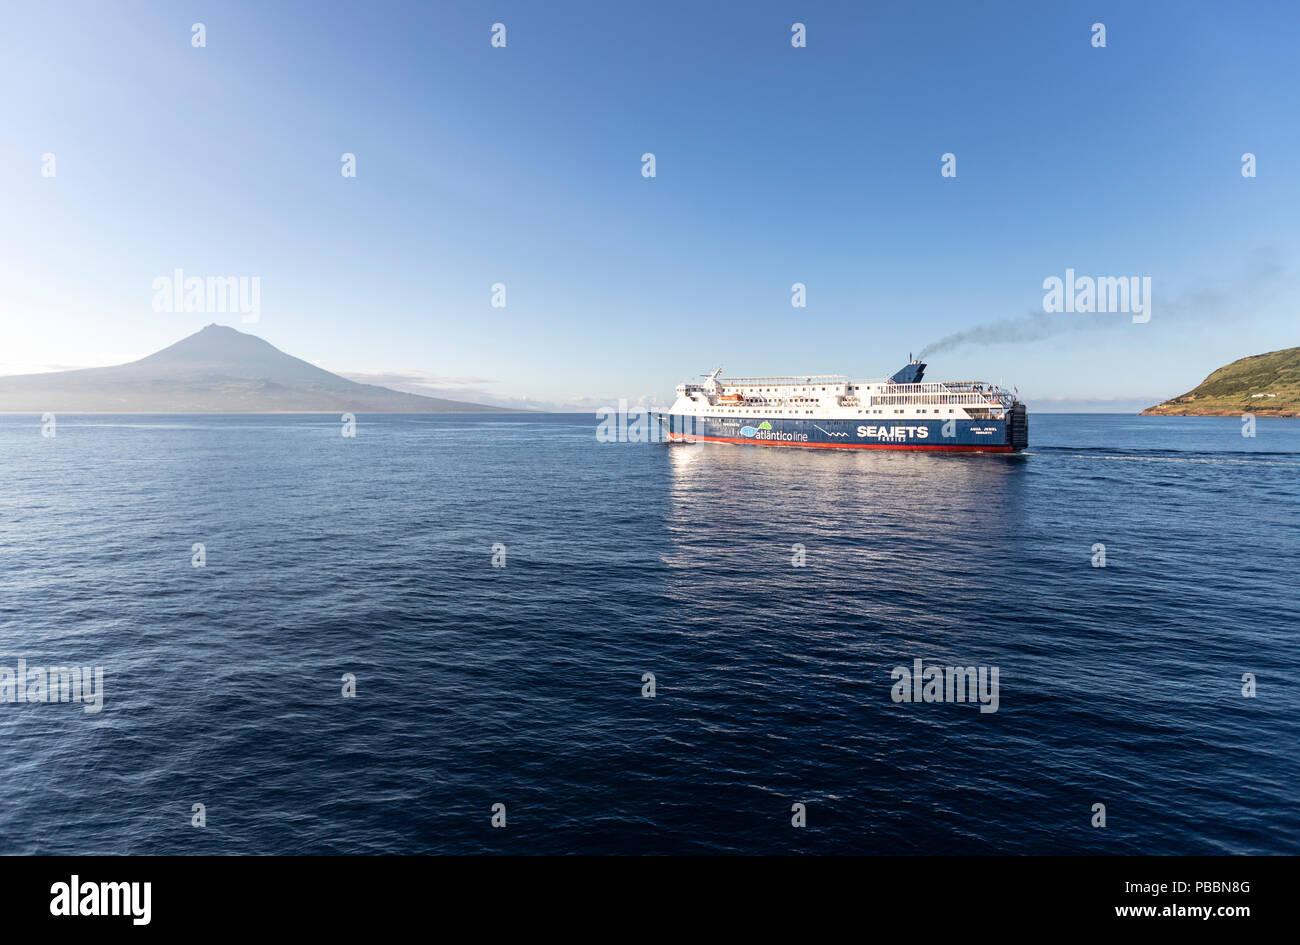 Passagiere Atlantico Linie Seajets Fähre nach Pico Island, mit dem Berg Pico bei Sonnenaufgang, den Azoren, Portugal Stockbild